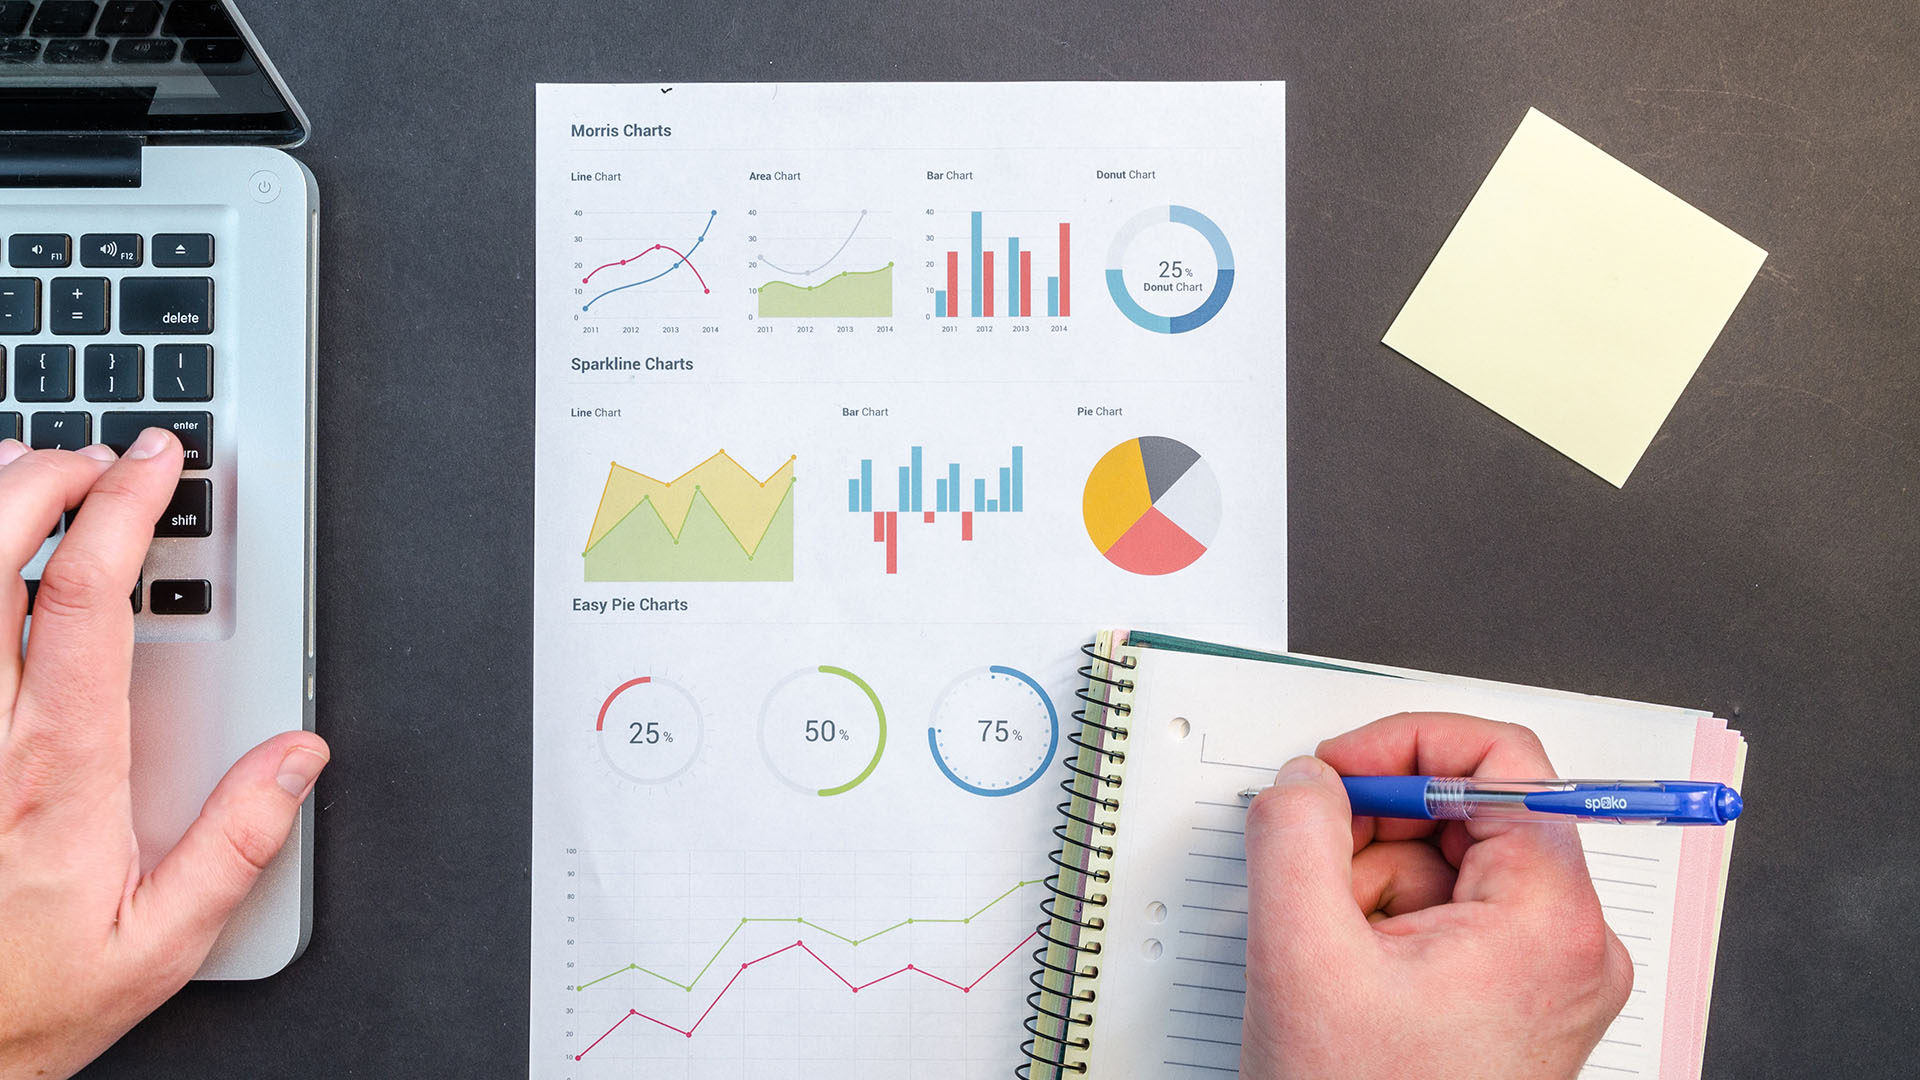 charts and computer data